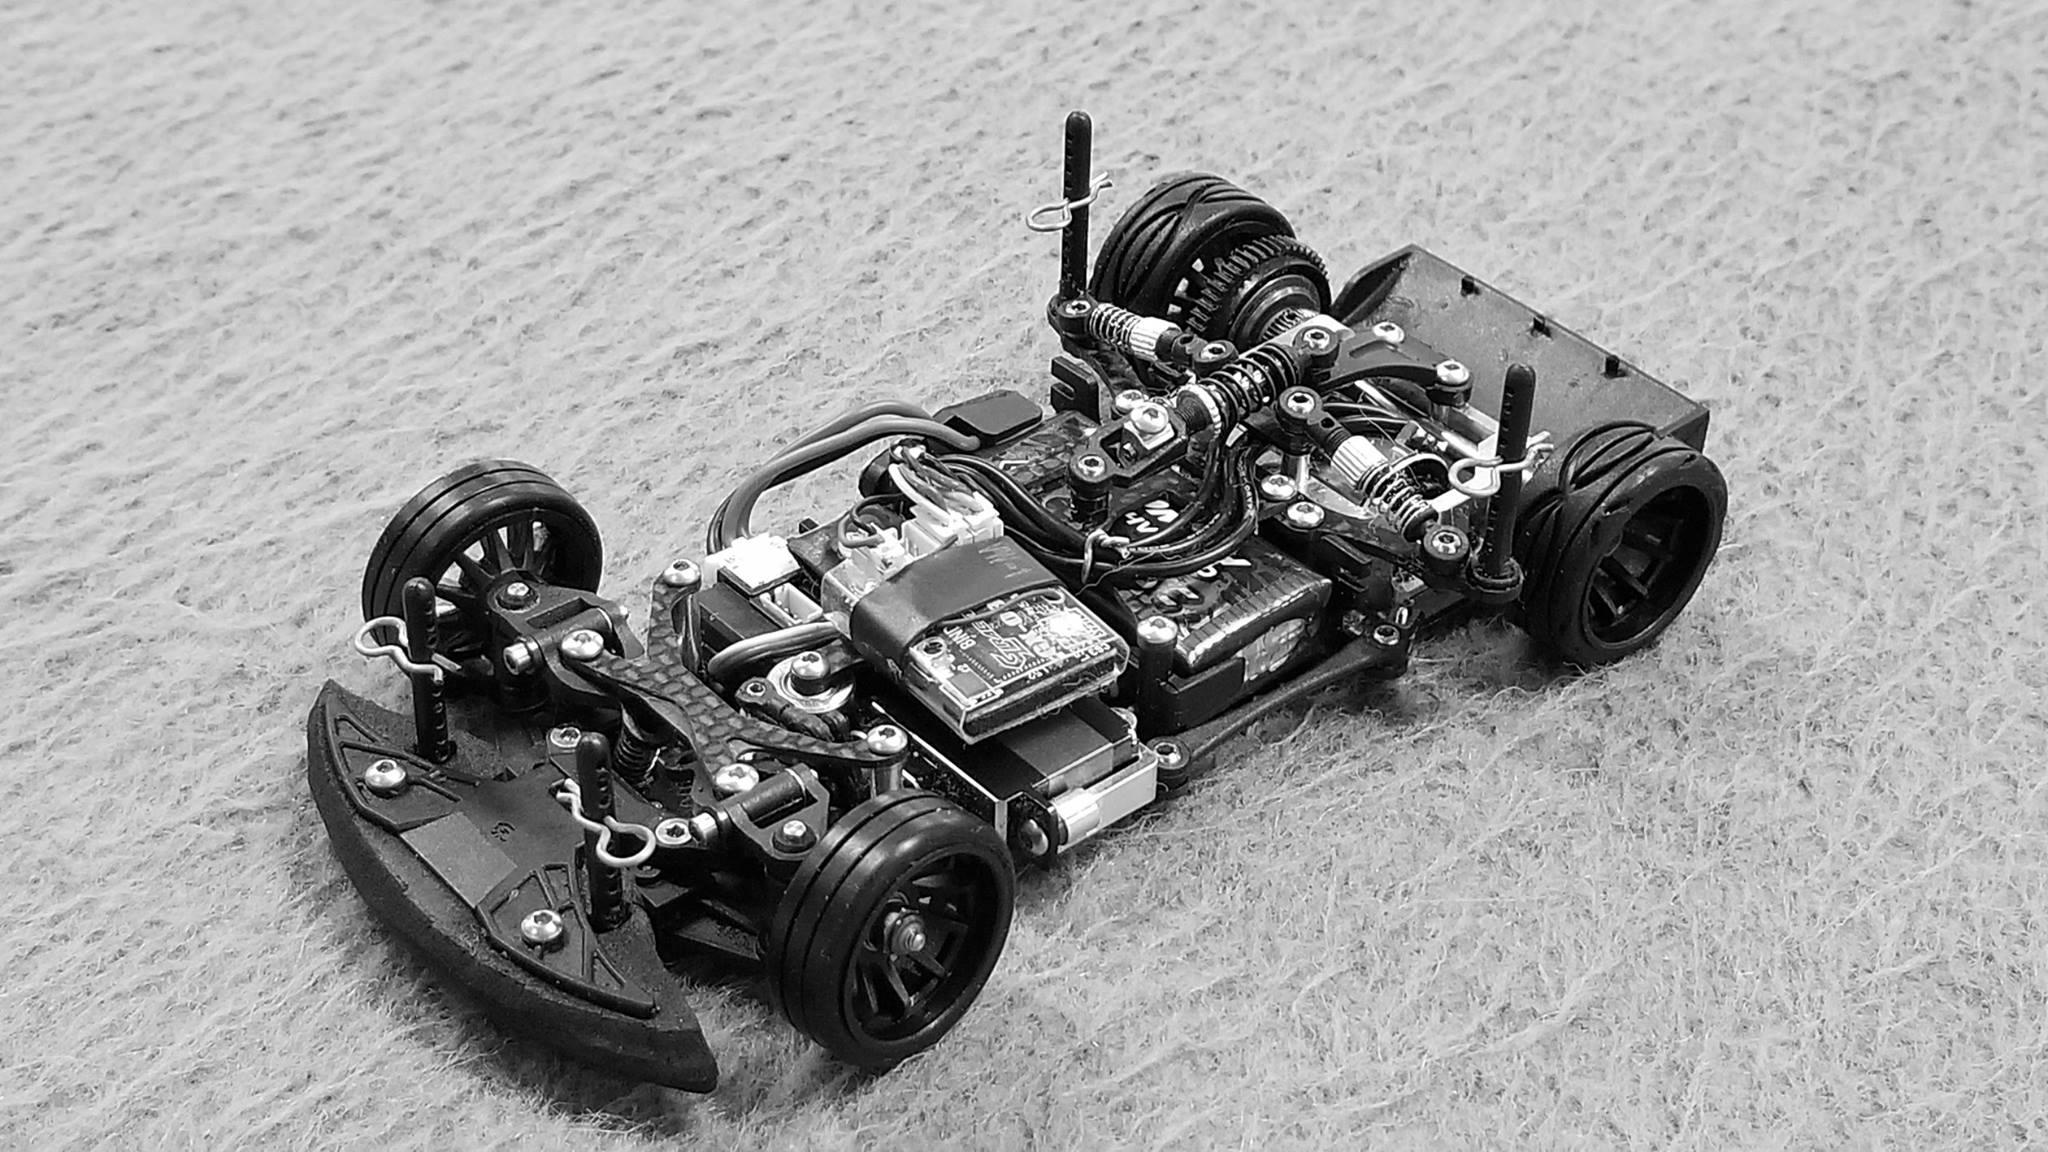 GLR 4x2 by GL racing 6227522417385019025036864438604630813476748281979o